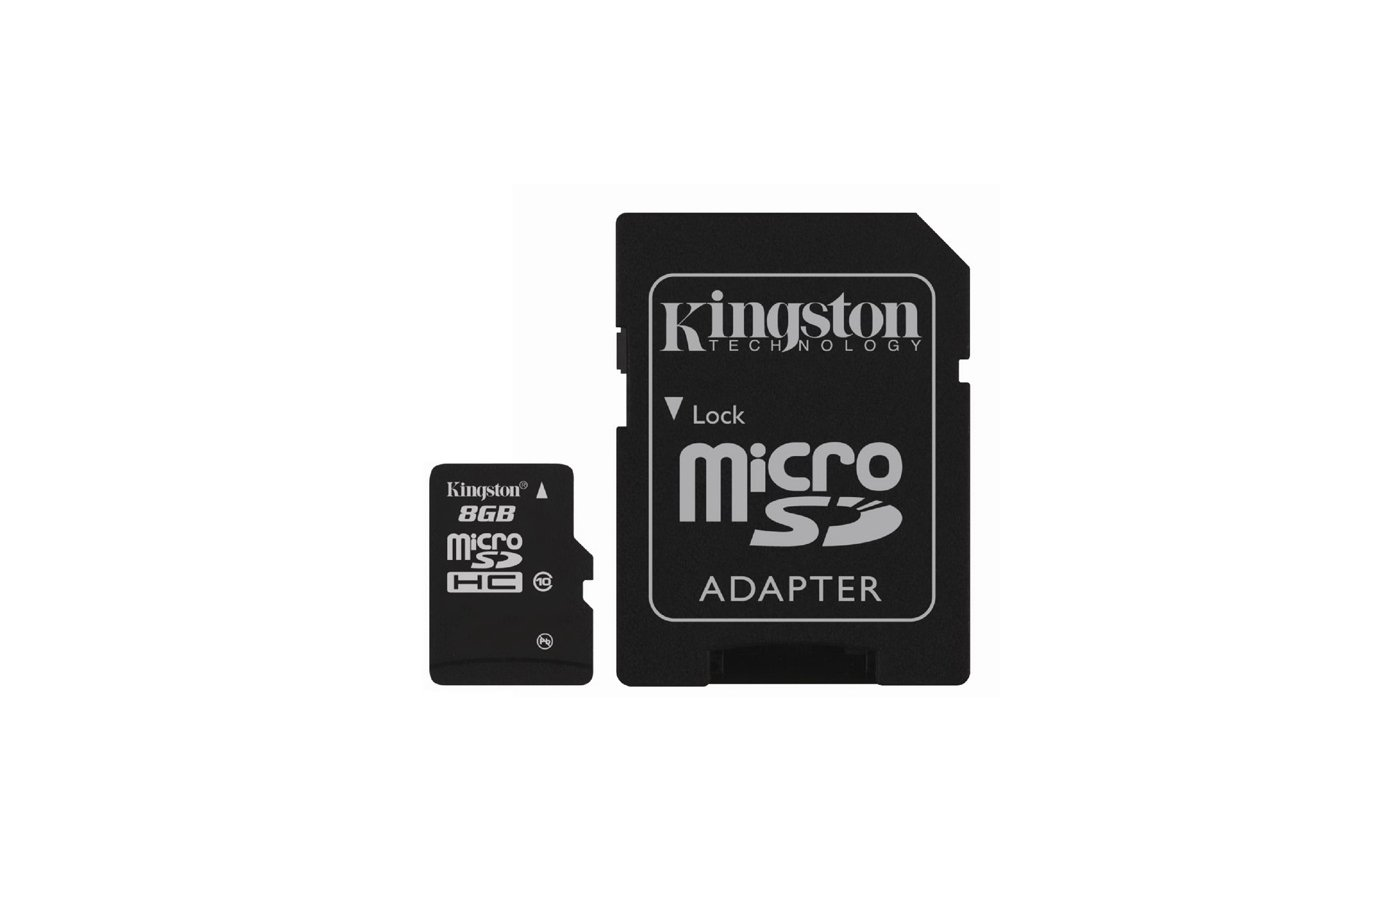 Карта памяти Kingston microSDHC 8Gb Class 10 + адаптер (SDC10/8GB)